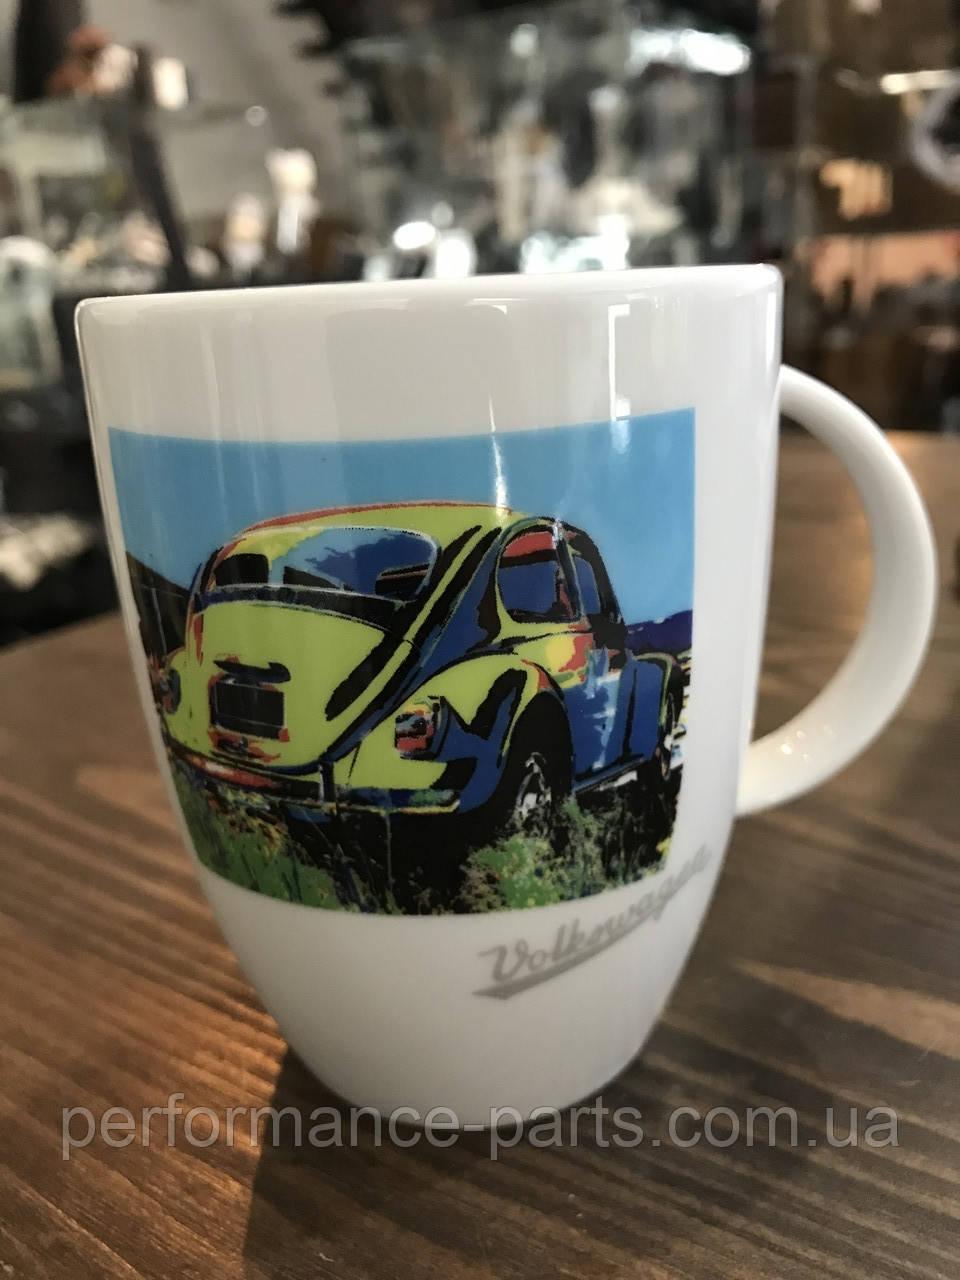 Фарфоровая кружка Volkswagen Mug Beetle, Pop-Art-Style V2 311069601